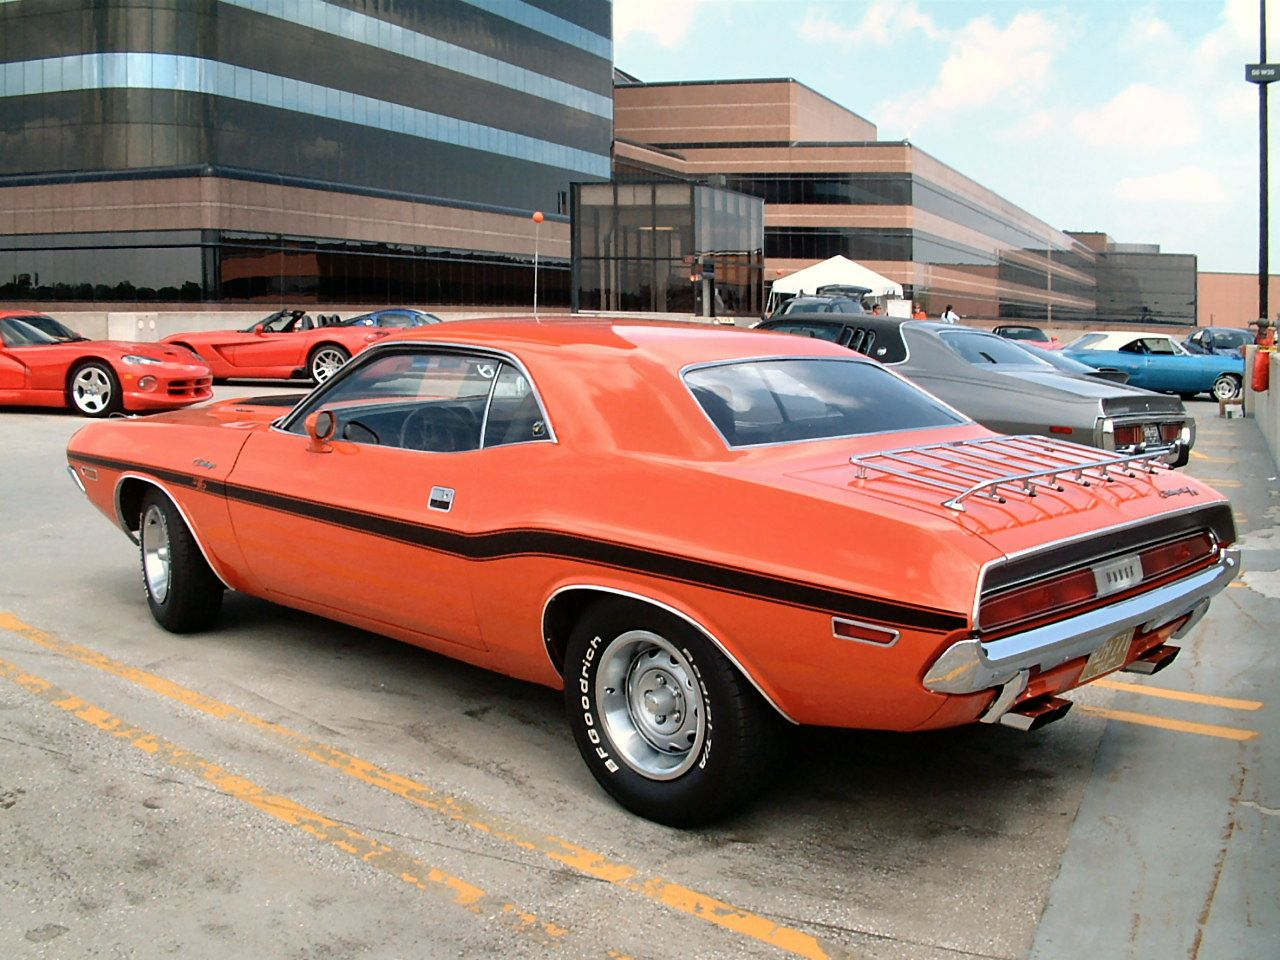 1970 Dodge Challenger Wallpaper Collection Dodge Challenger Mopar Dodge